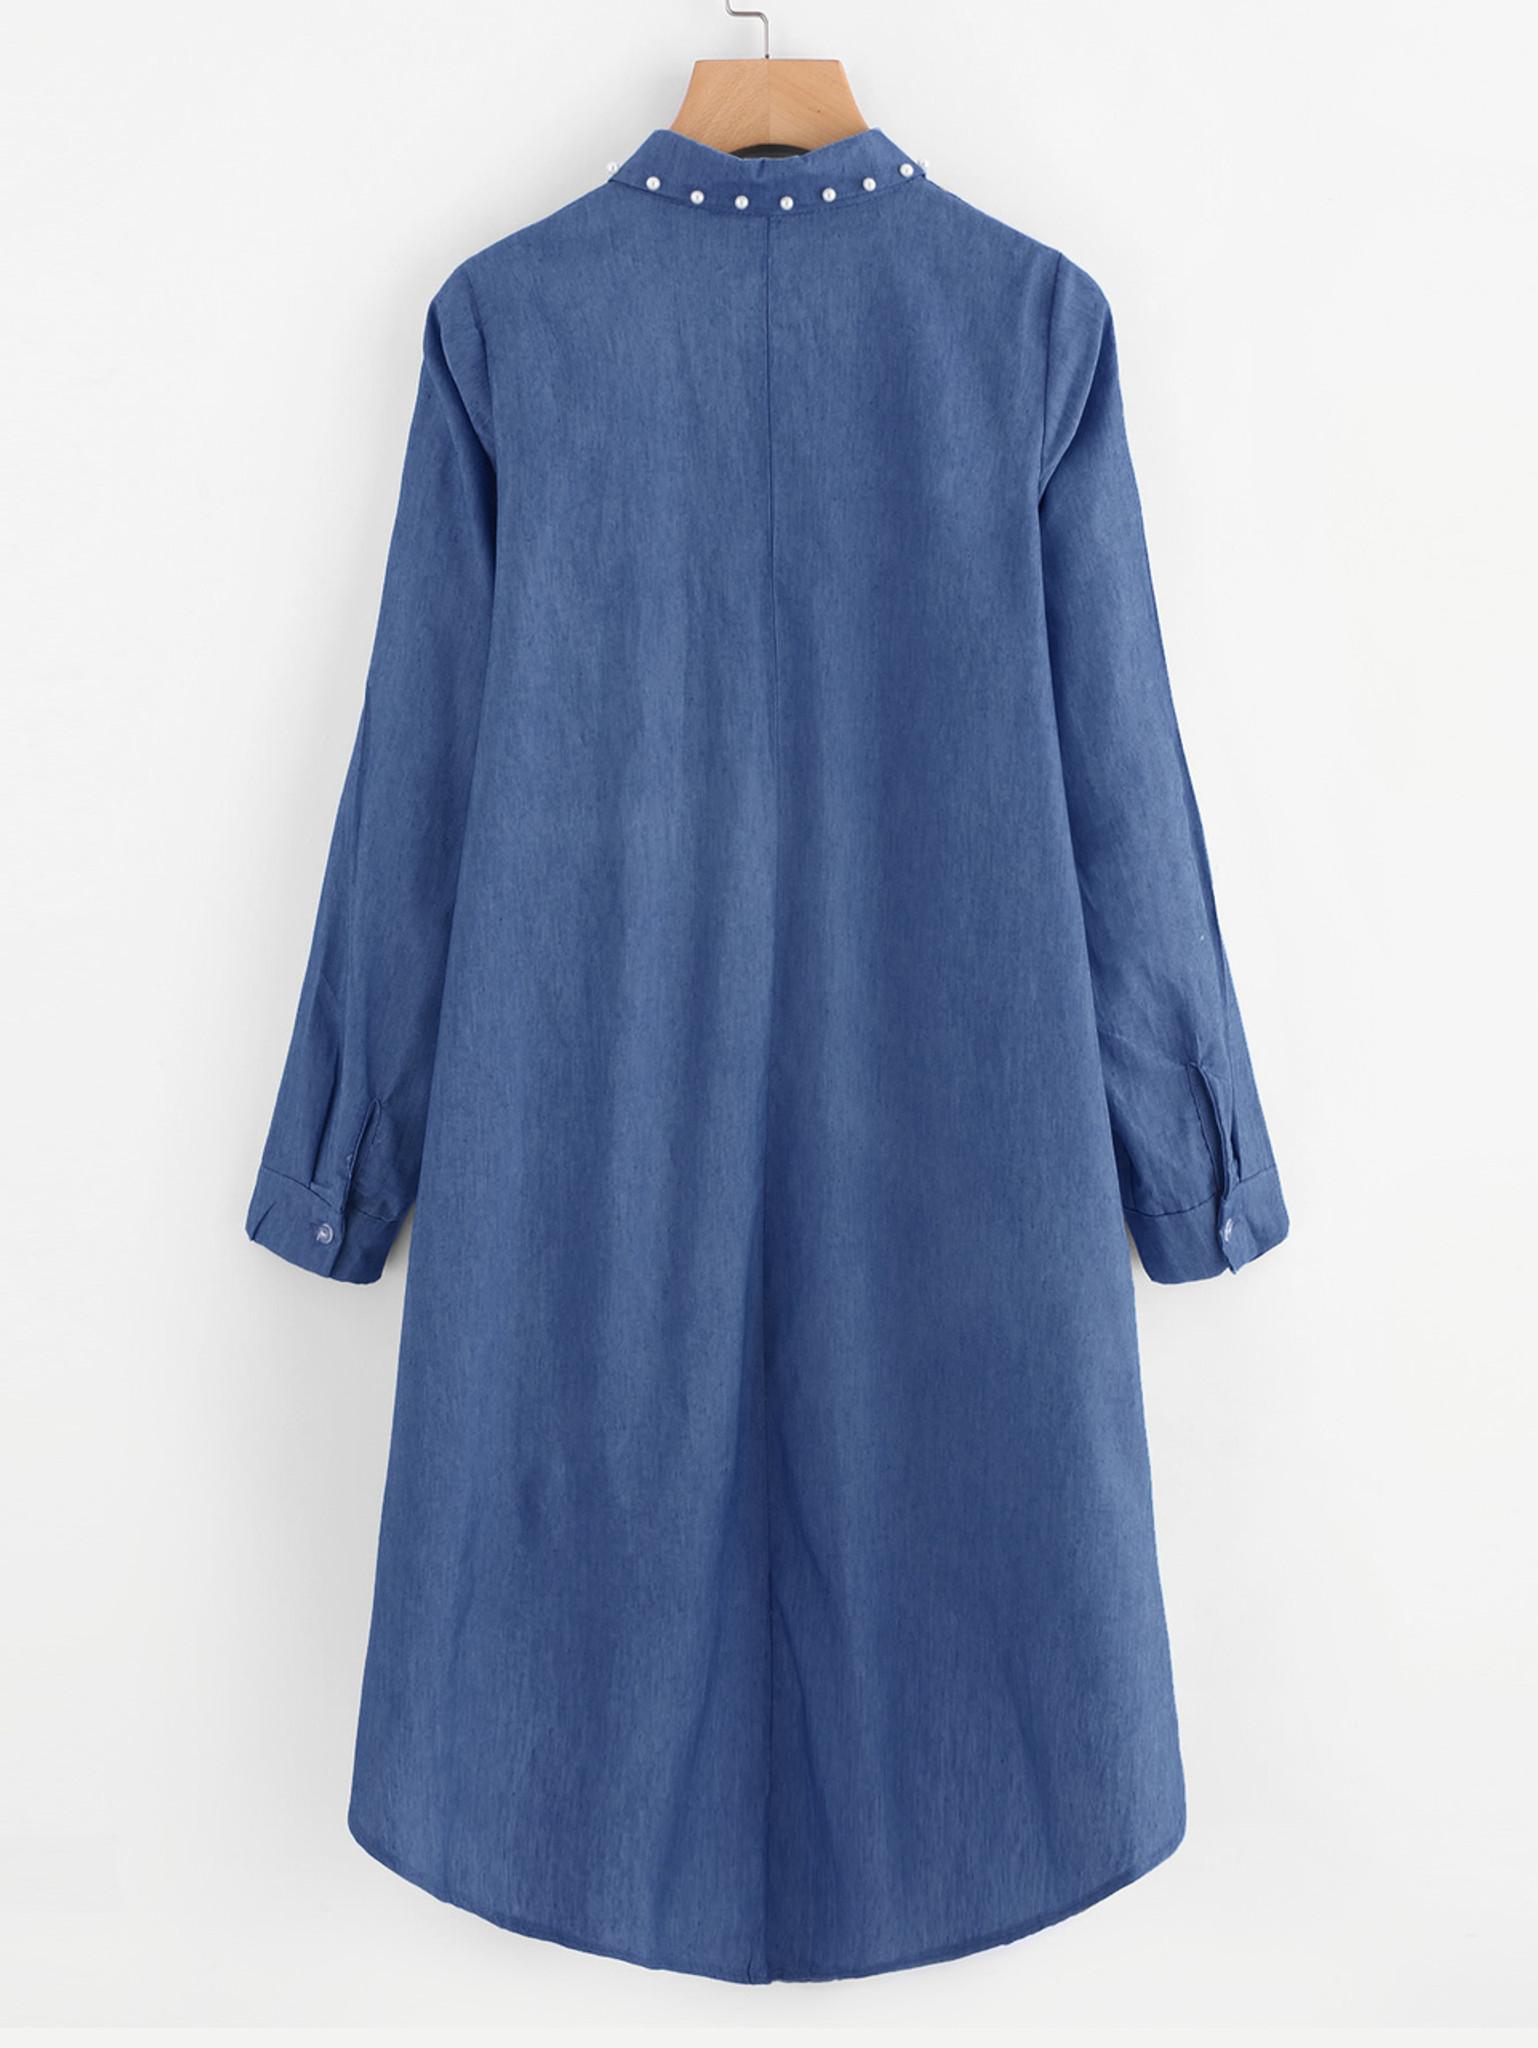 Fifth Avenue Women's Chambray Denim Heavy Beaded High Low Shirt - Dark Blue